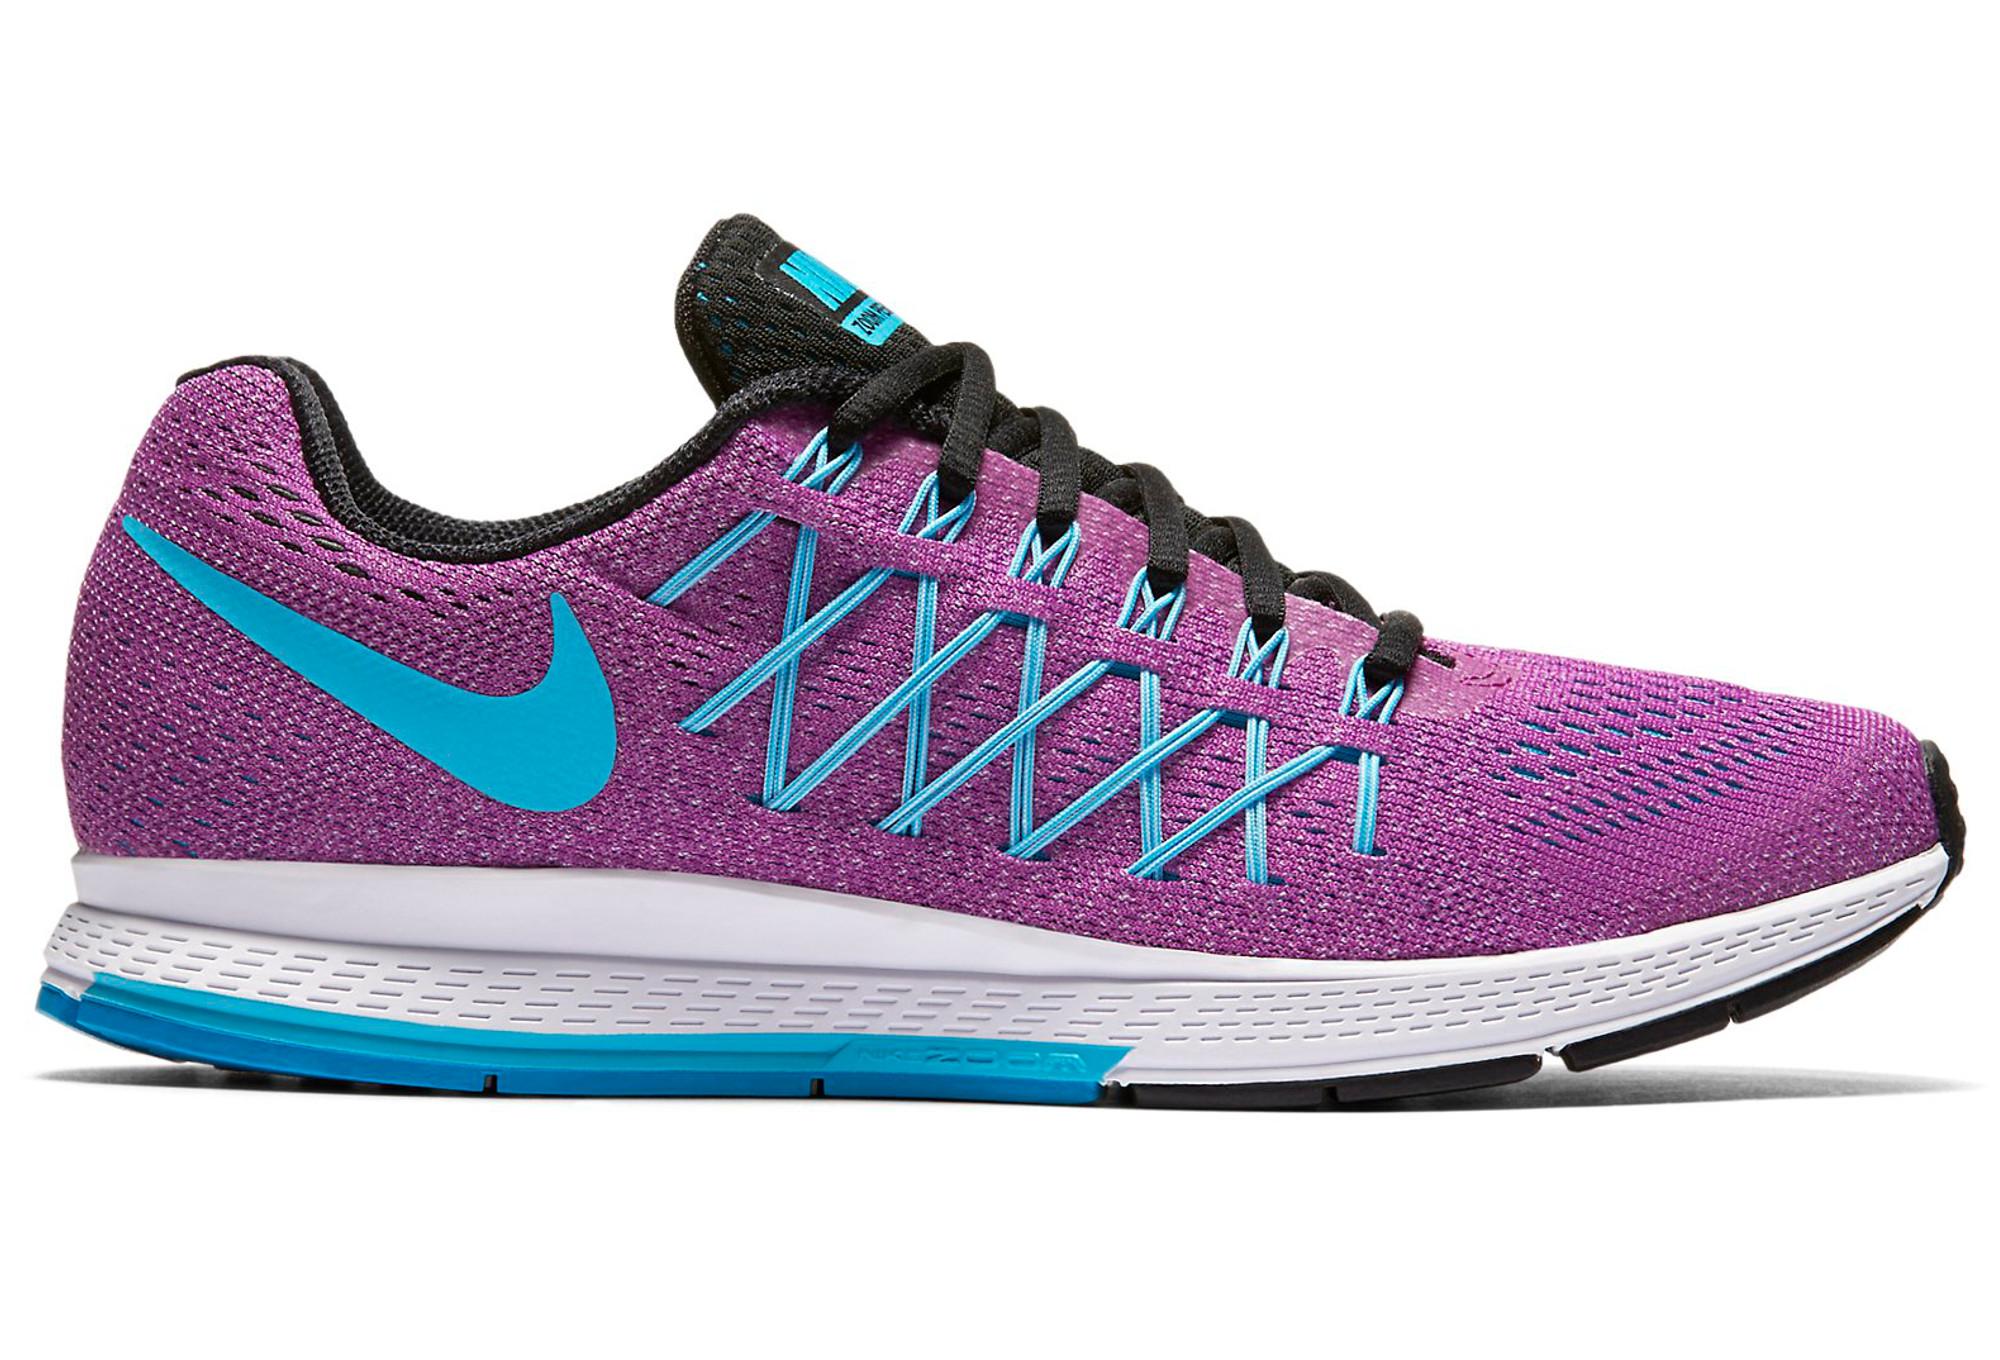 various colors 04480 289dc Chaussures de Running Femme Nike AIR ZOOM PEGASUS 32 Violet ...